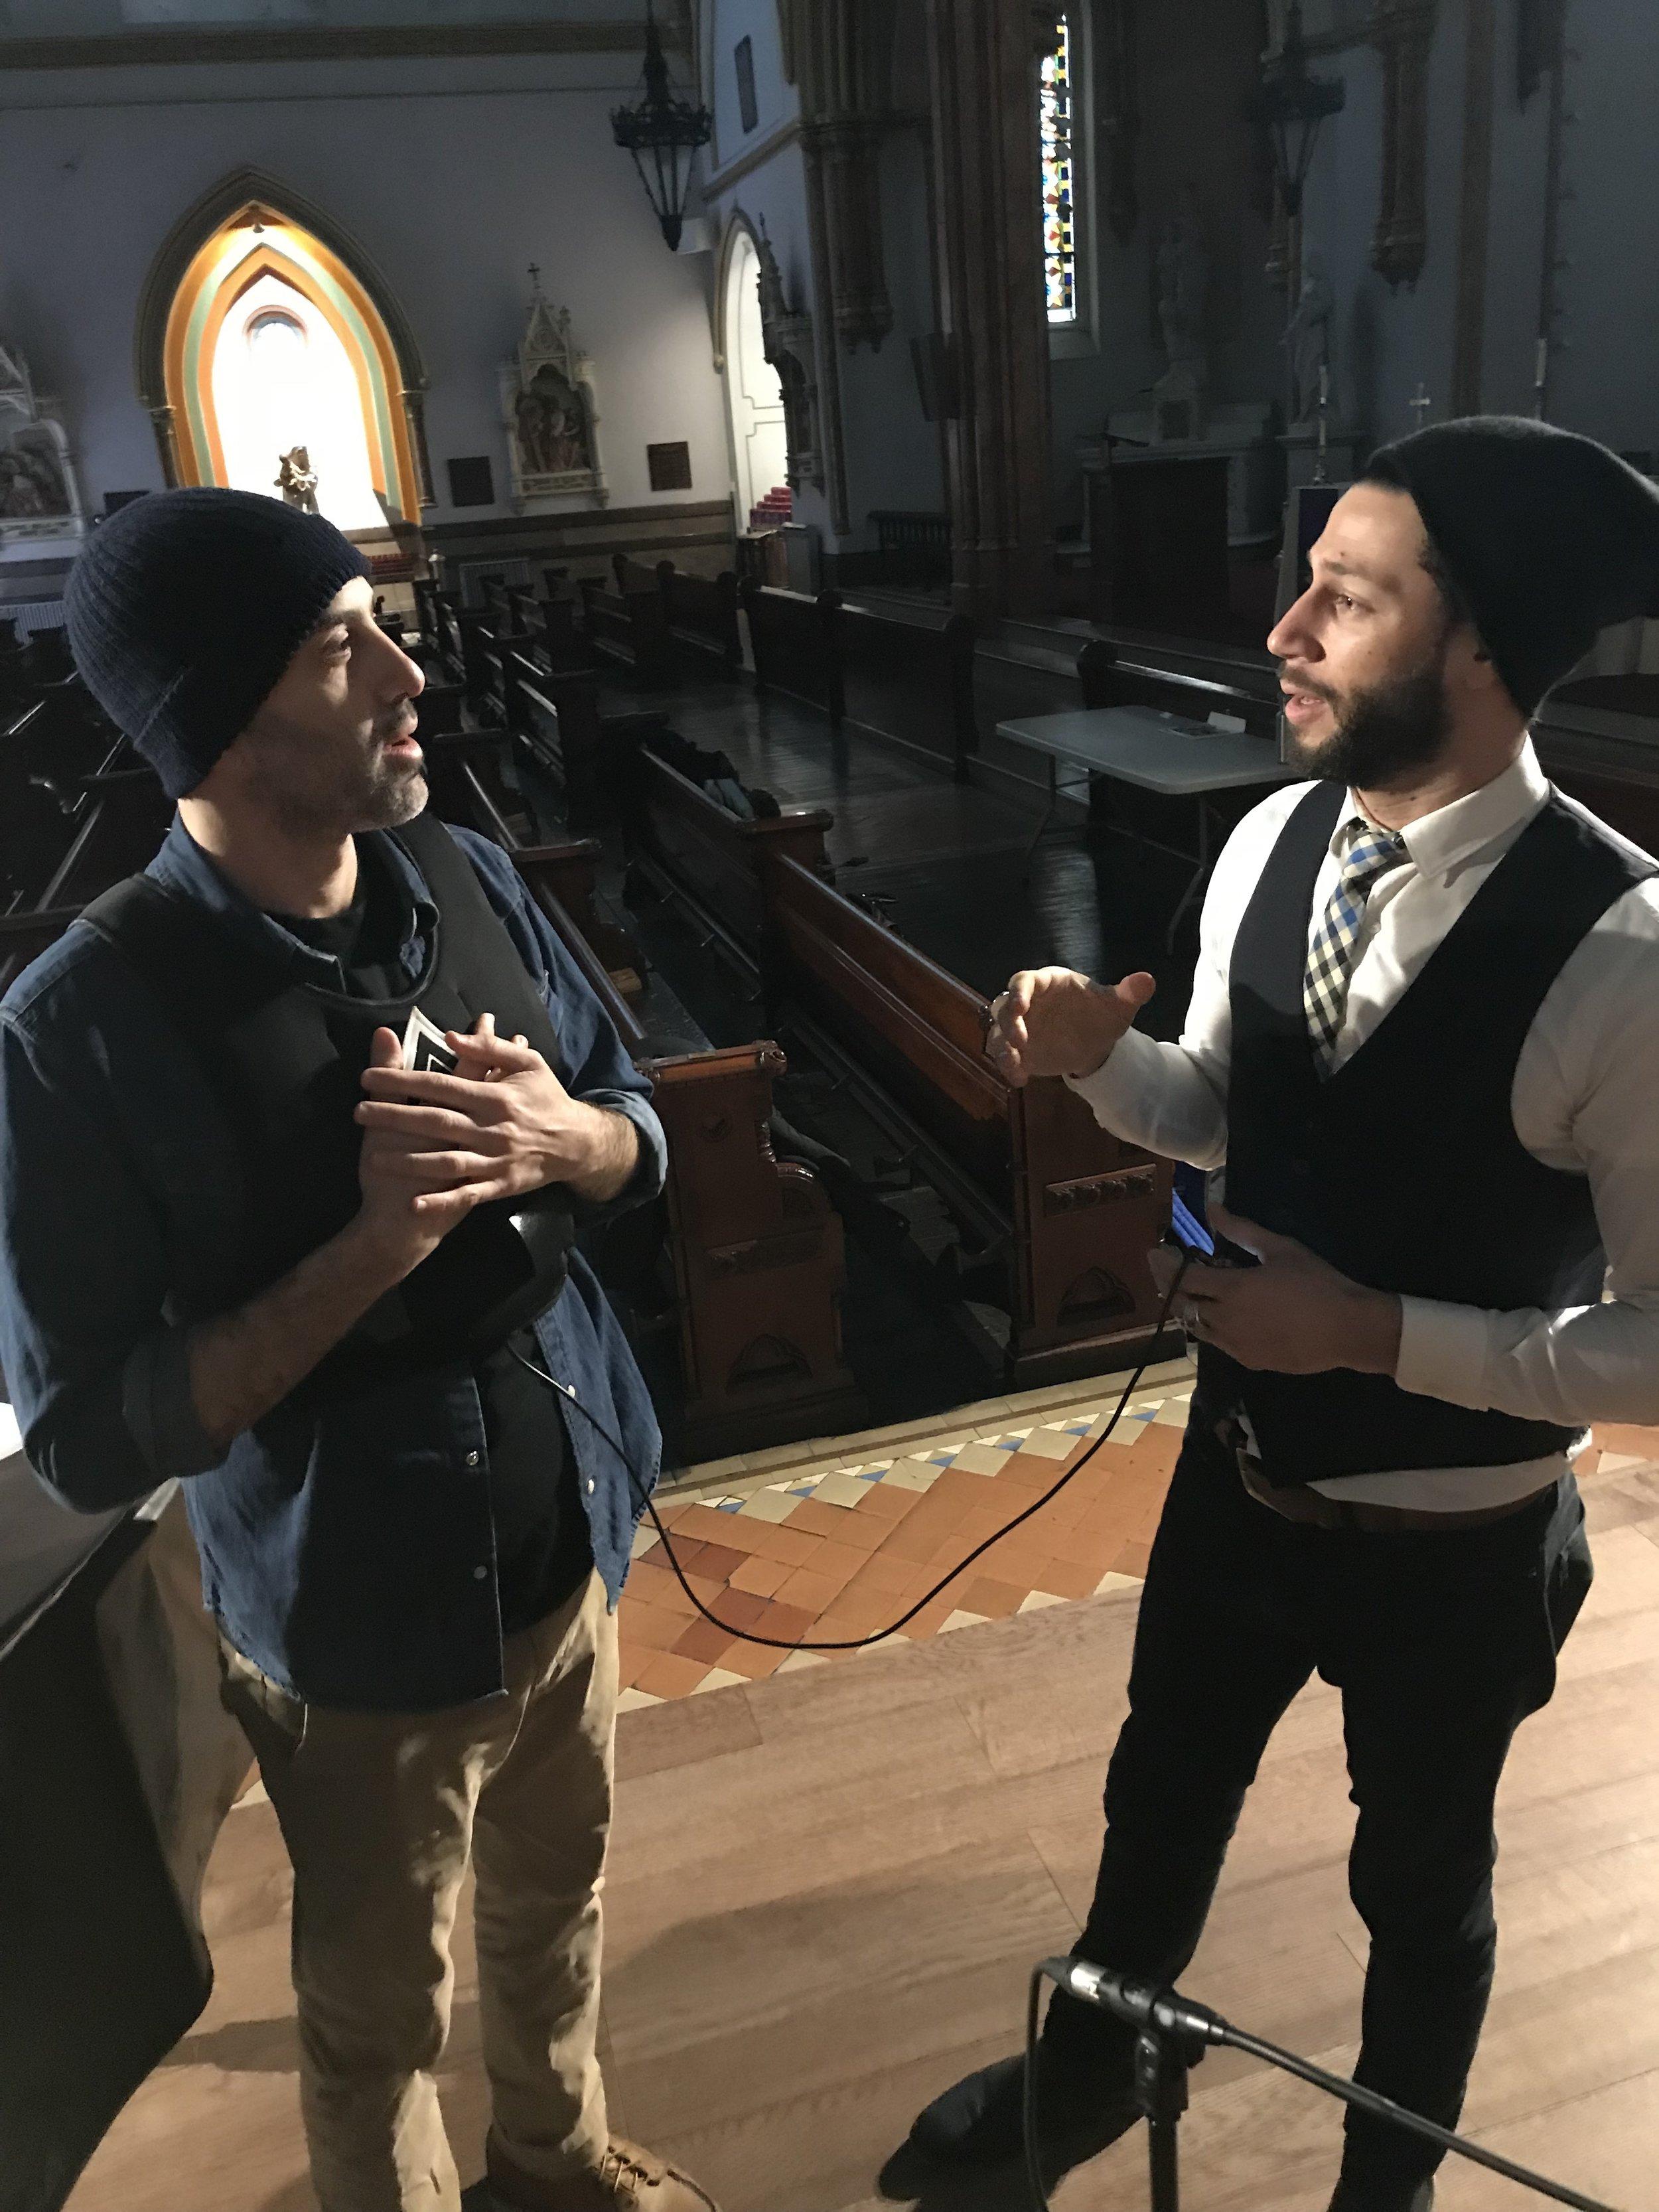 Collaboration Talks with Misha Jones, creator of Stereocilla